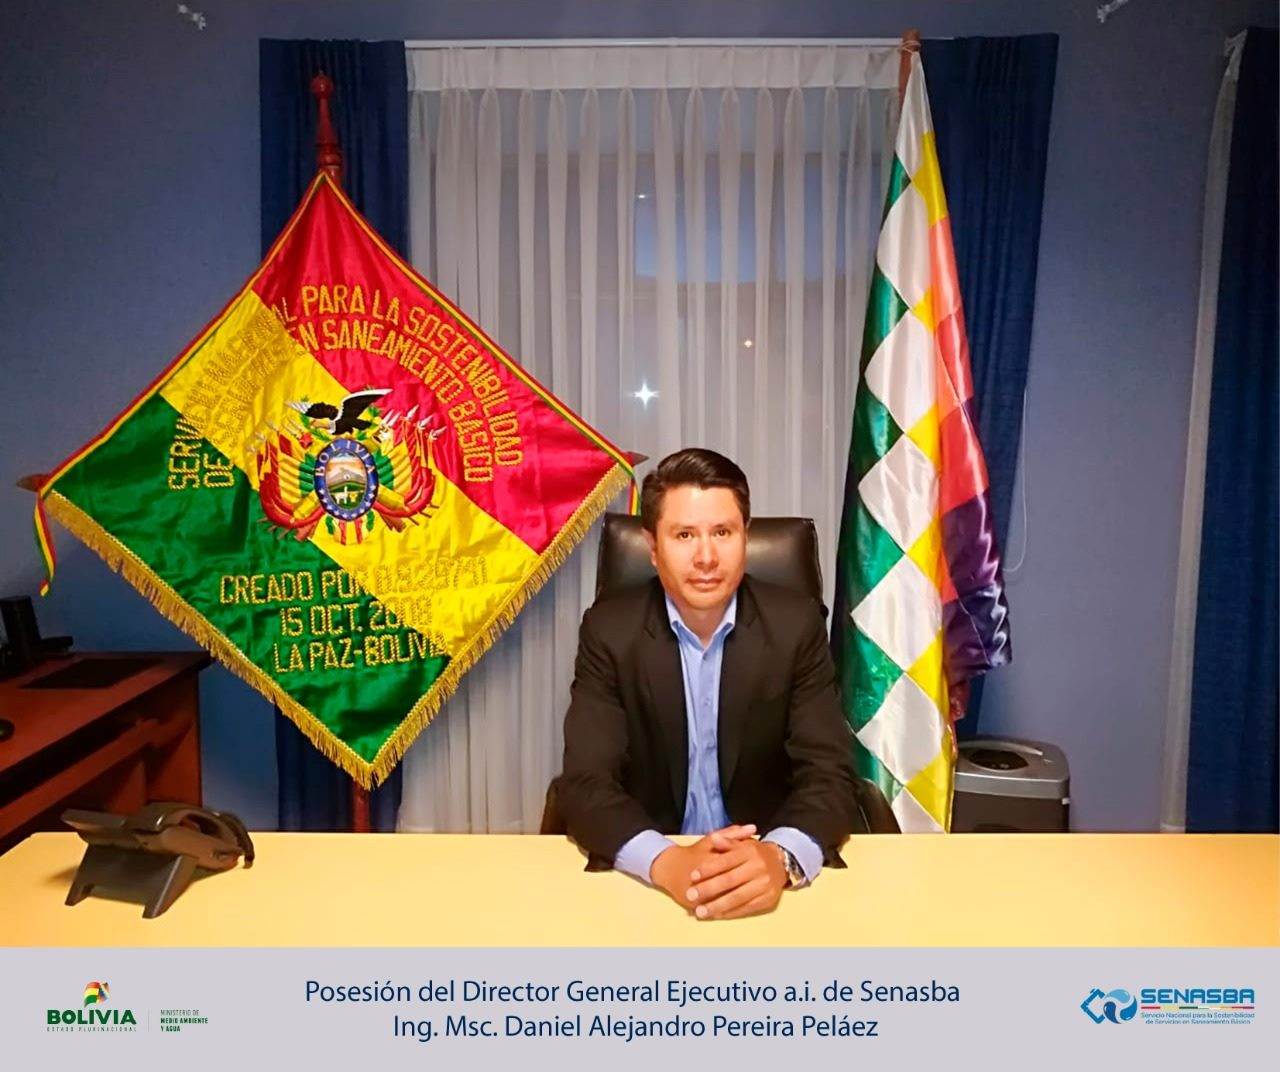 Se posesiona al Ing. Msc. Daniel Alejandro Pereira Peláez como nuevo Director General Ejecutivo del SENASBA